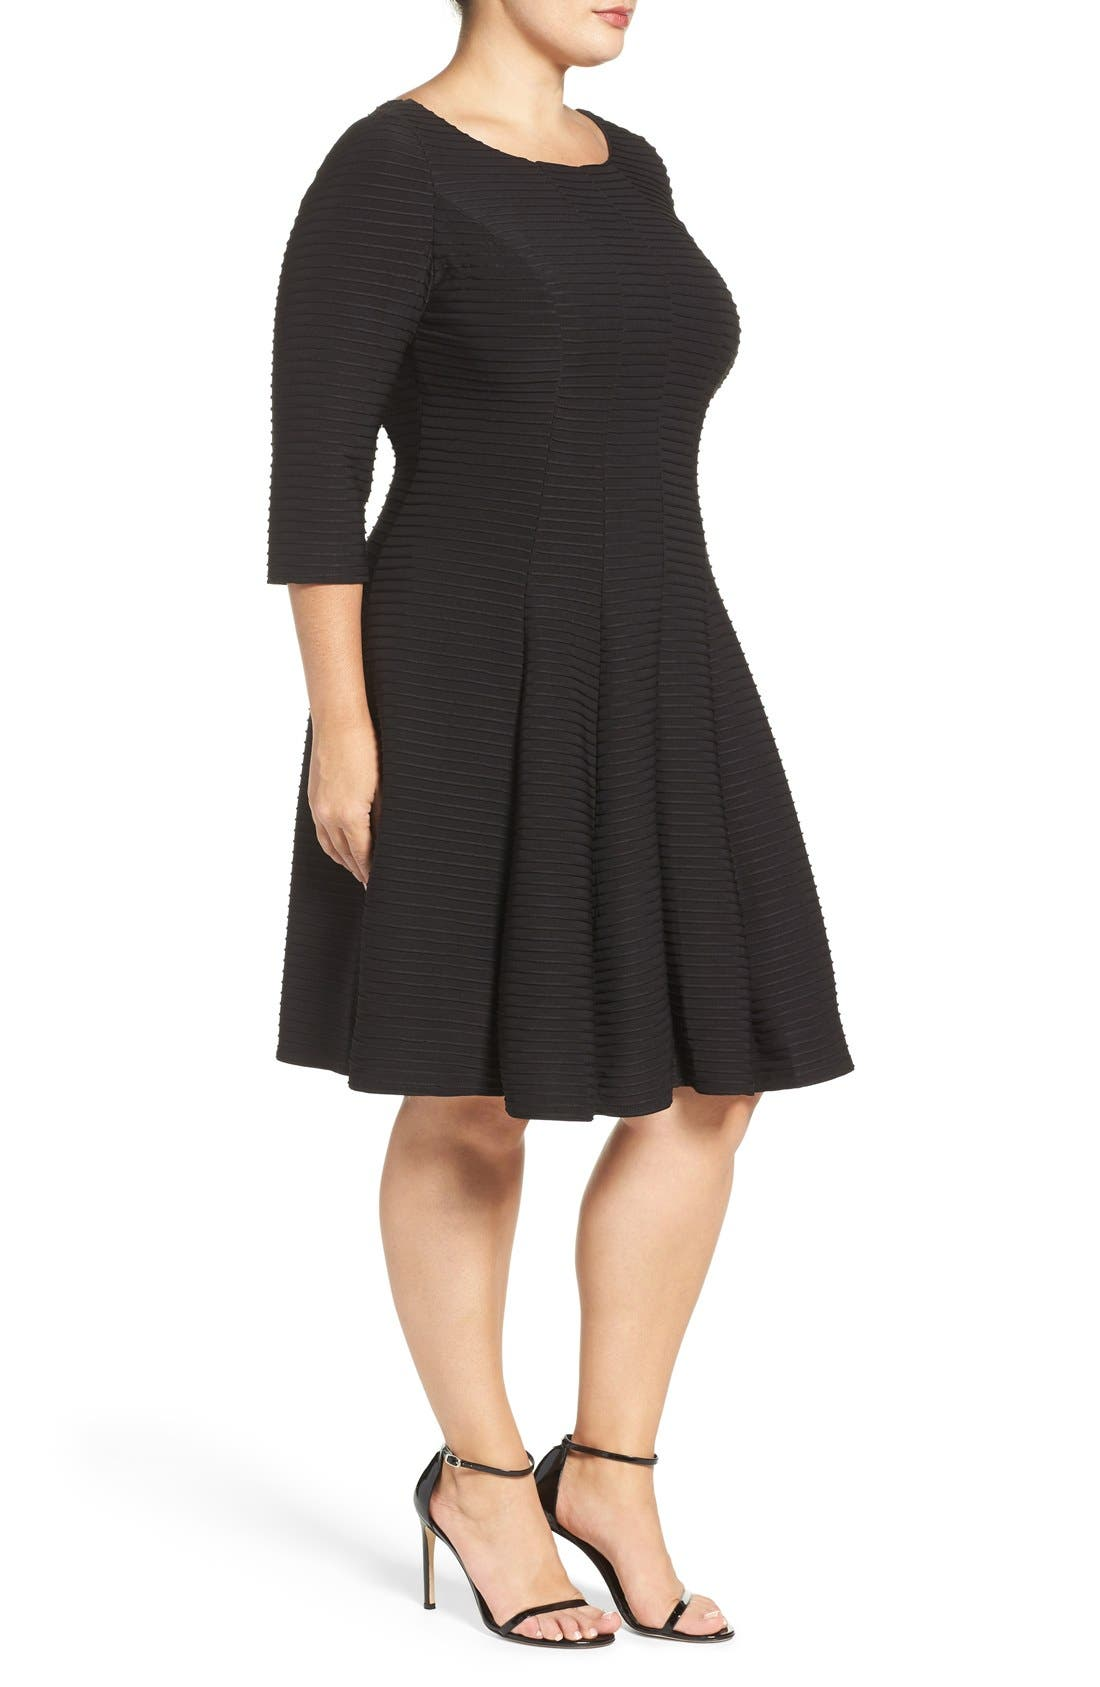 Alternate Image 3  - Gabby Skye Pintuck Knit Fit & Flare Dress (Plus Size)